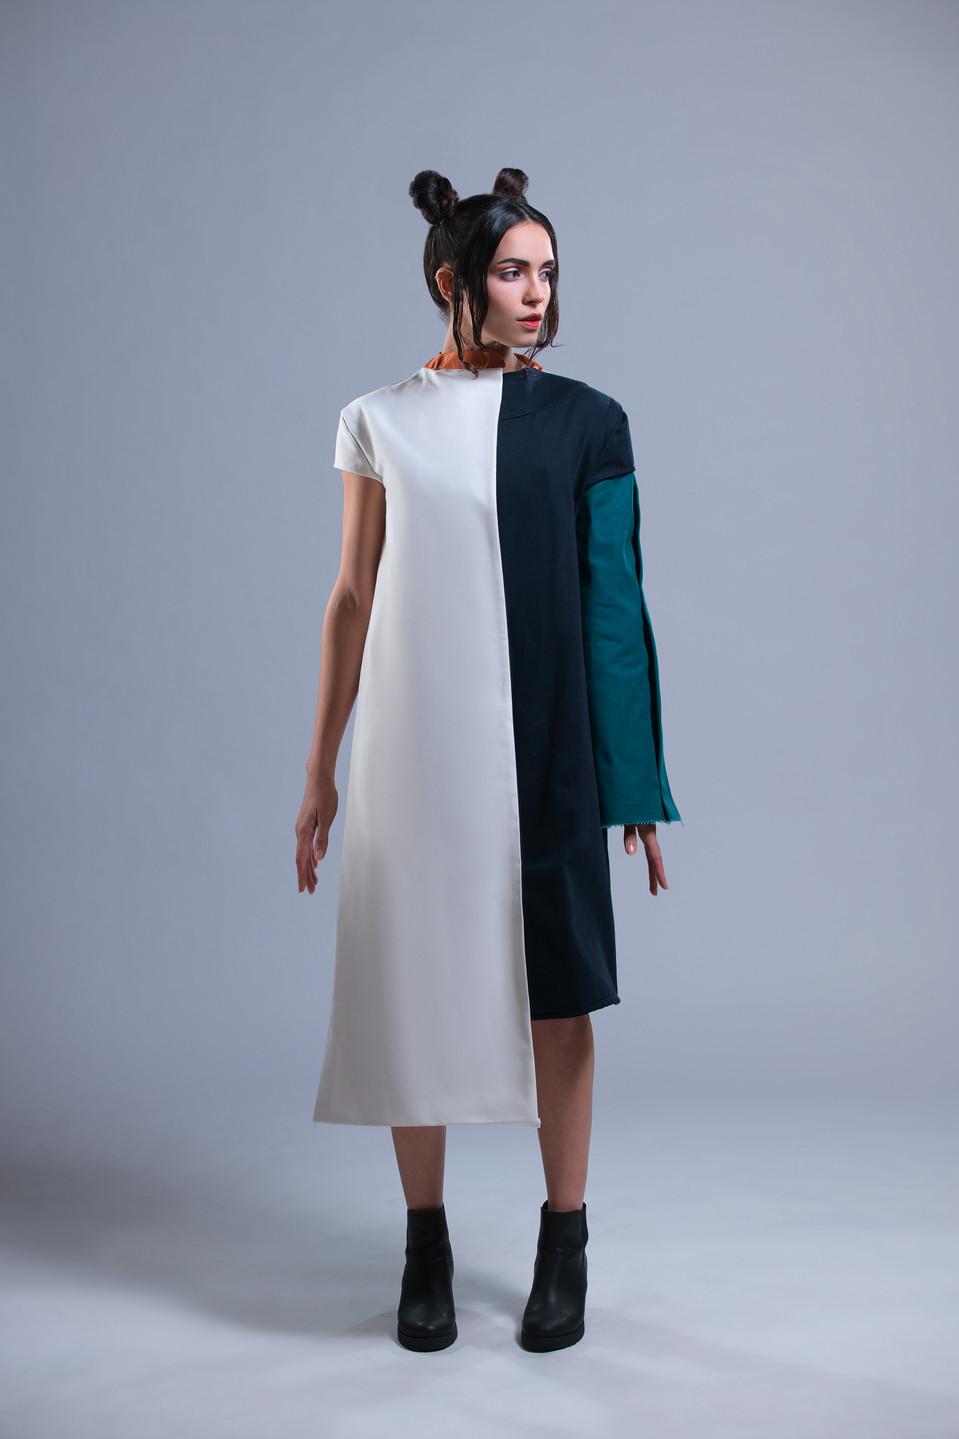 singapore-fashion-designer.jpg